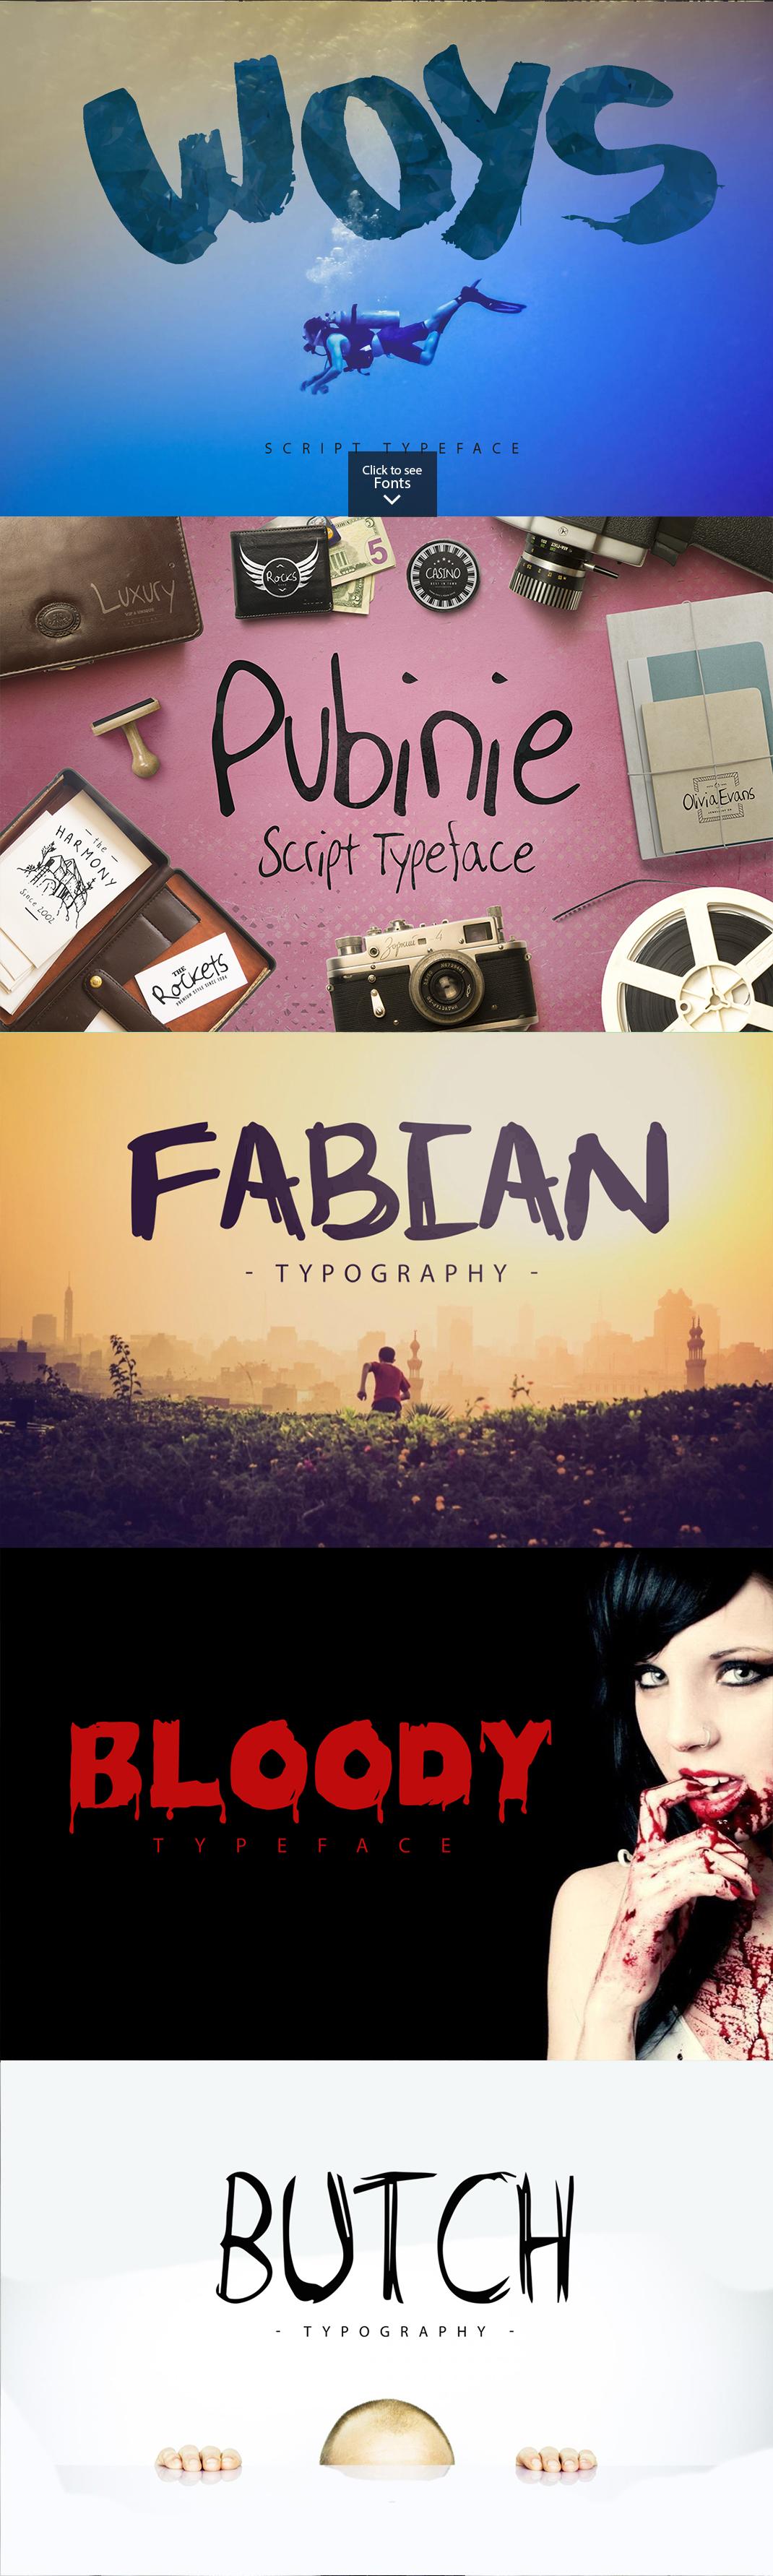 25 Fonts Bundle example image 6